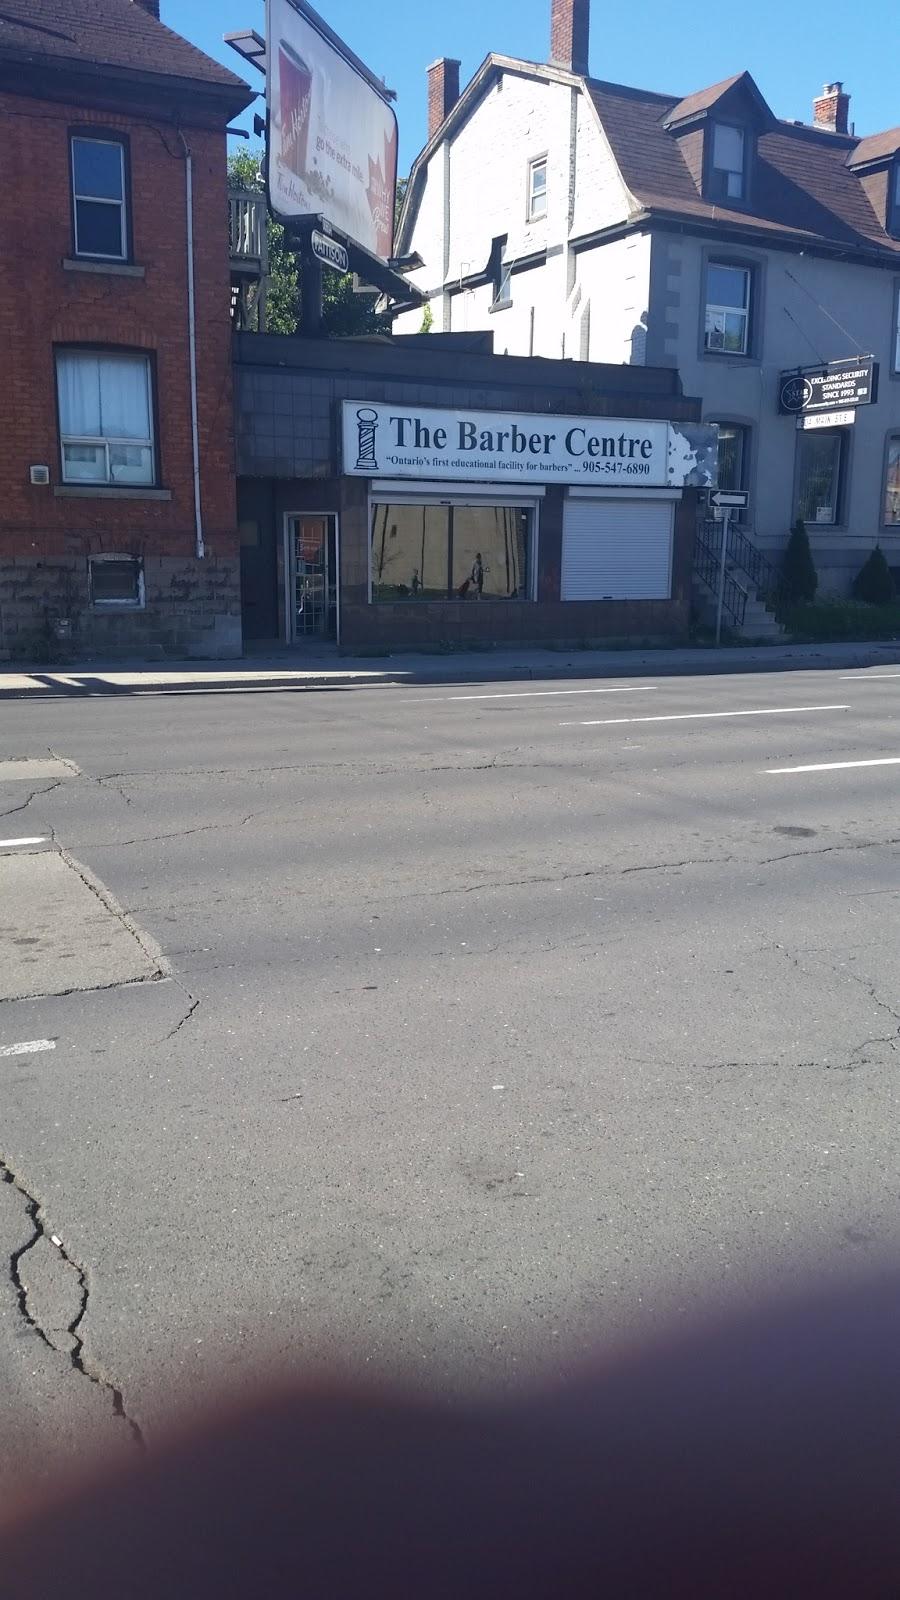 Barber Centre | hair care | 510 Main St E, Hamilton, ON L8N 1K7, Canada | 9055476890 OR +1 905-547-6890